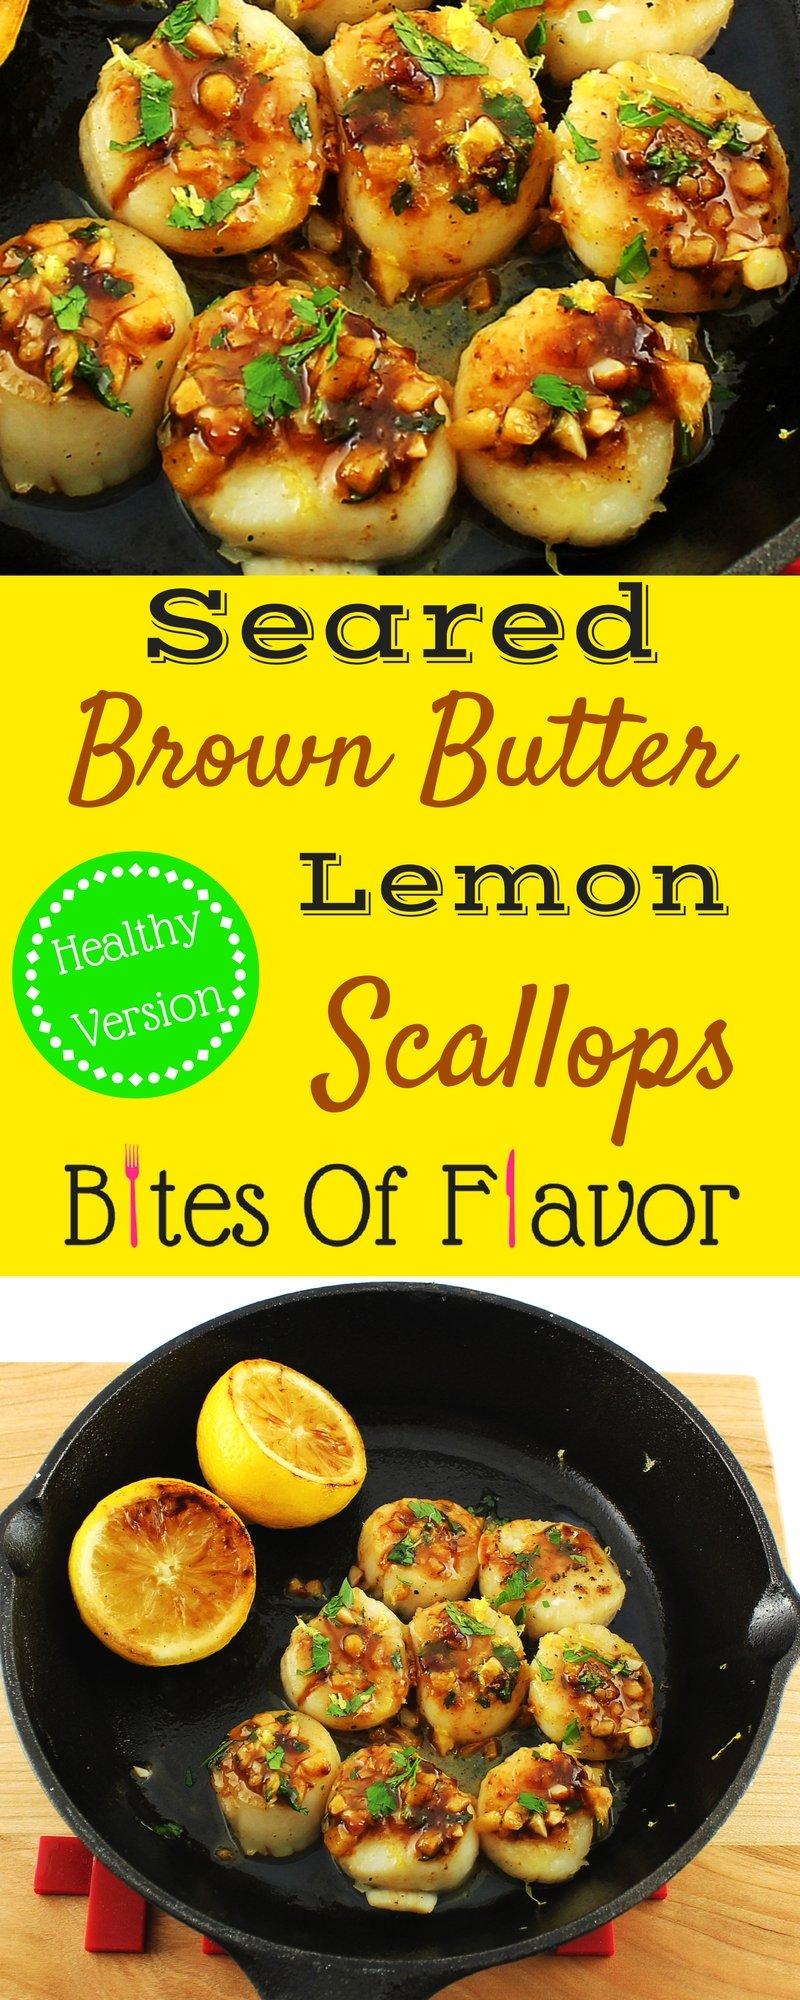 Garlic Lemon Scallops